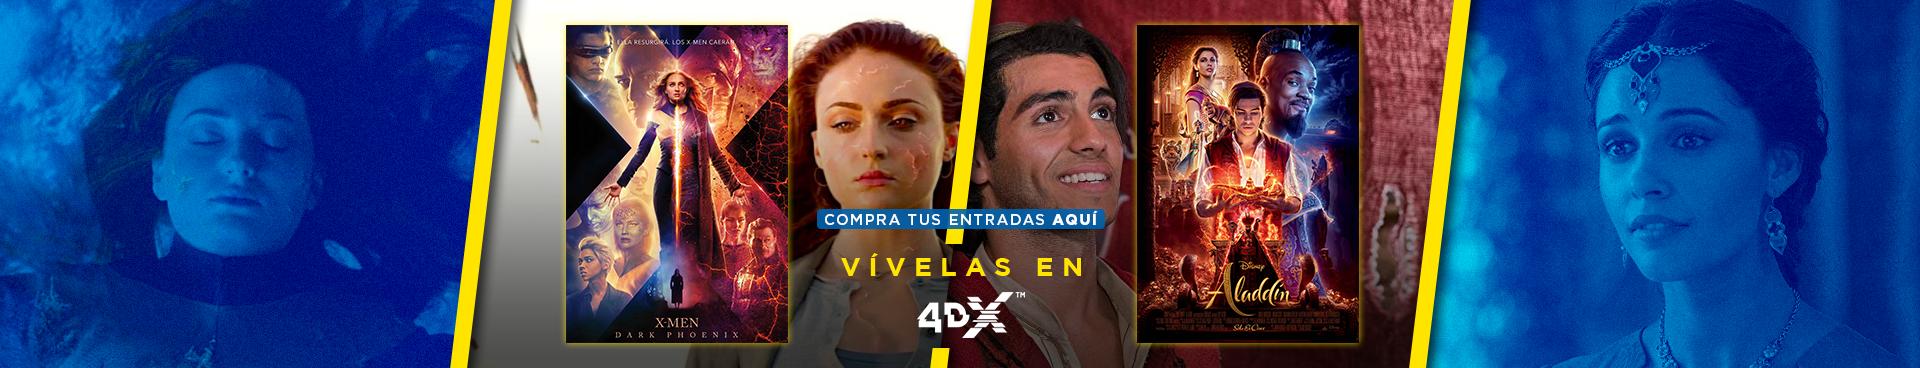 VIVELA EN 4DX: XMEN: DARK PHOENIX + ALADDIN, COMPRA AQUÍ TUS ENTRADAS